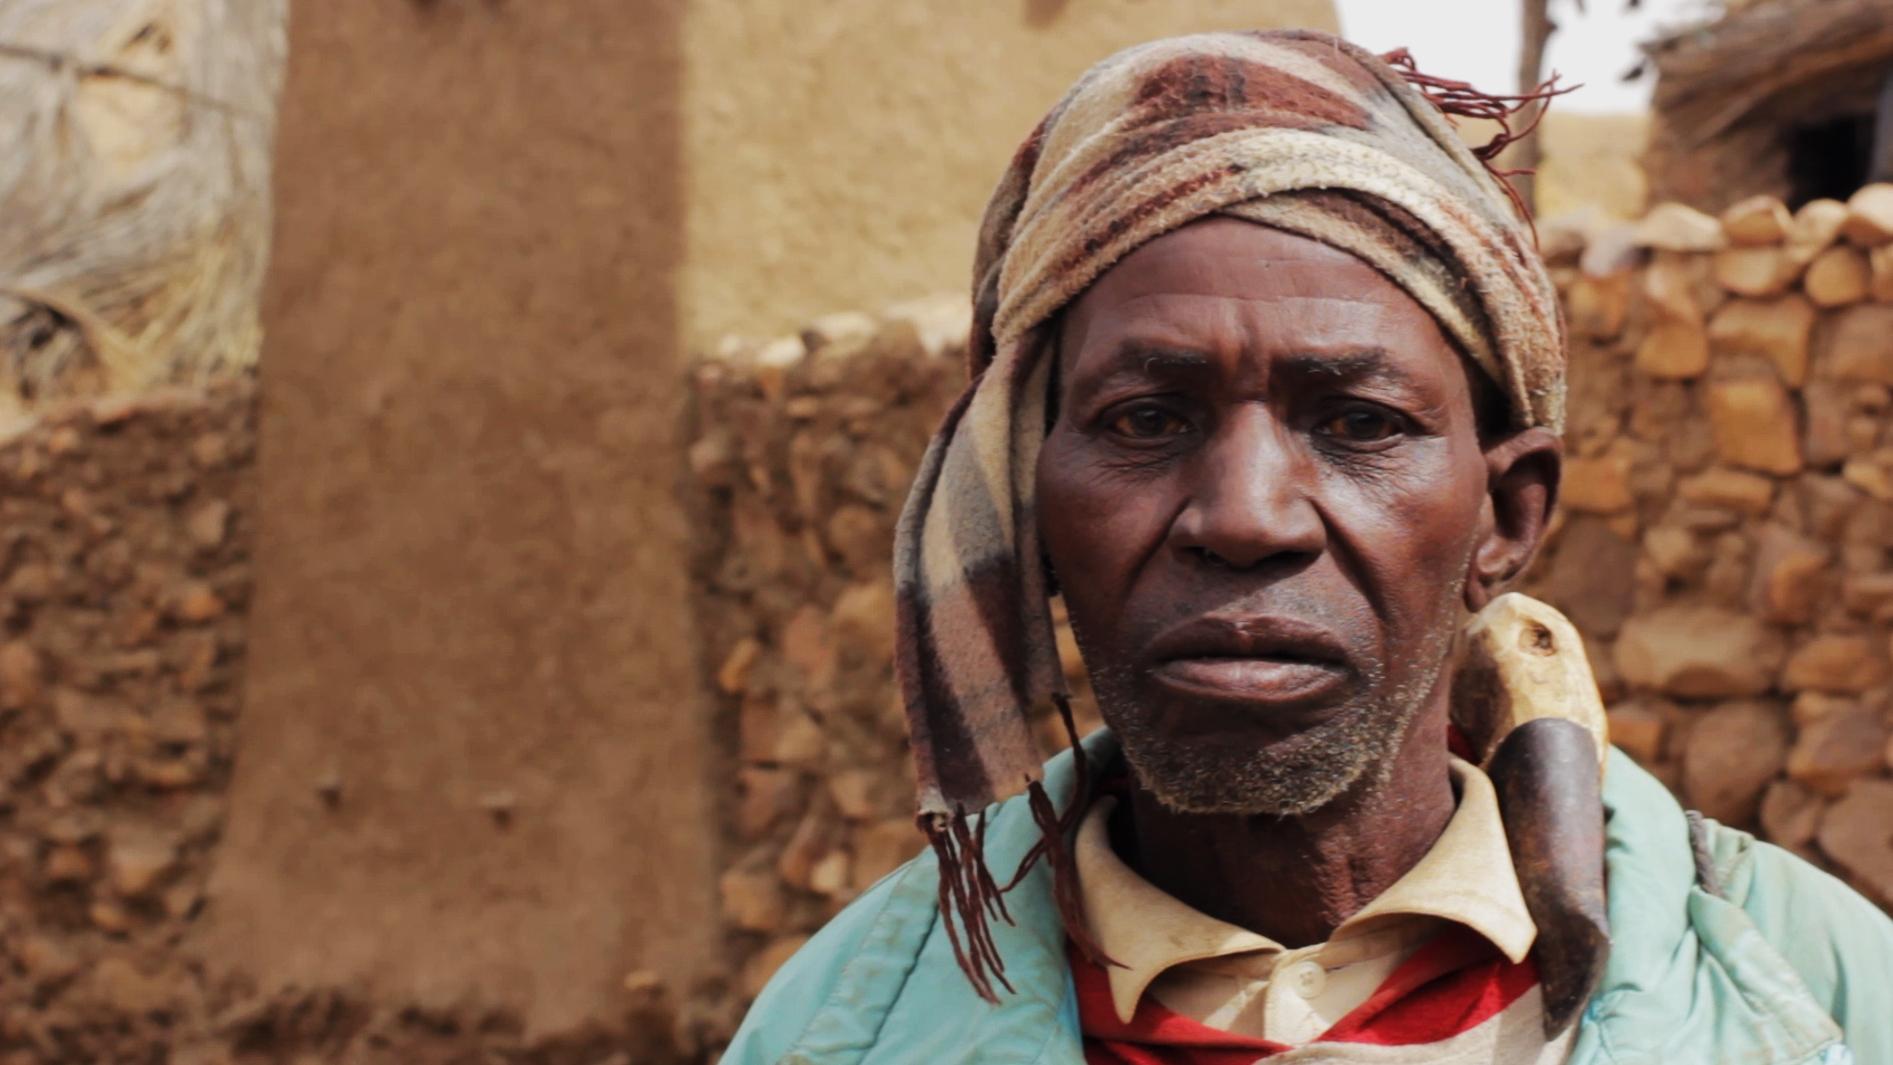 dogon djiguibombo pablocaminante bandido cine - Malí 5, País Dogon II: Djiguibombó